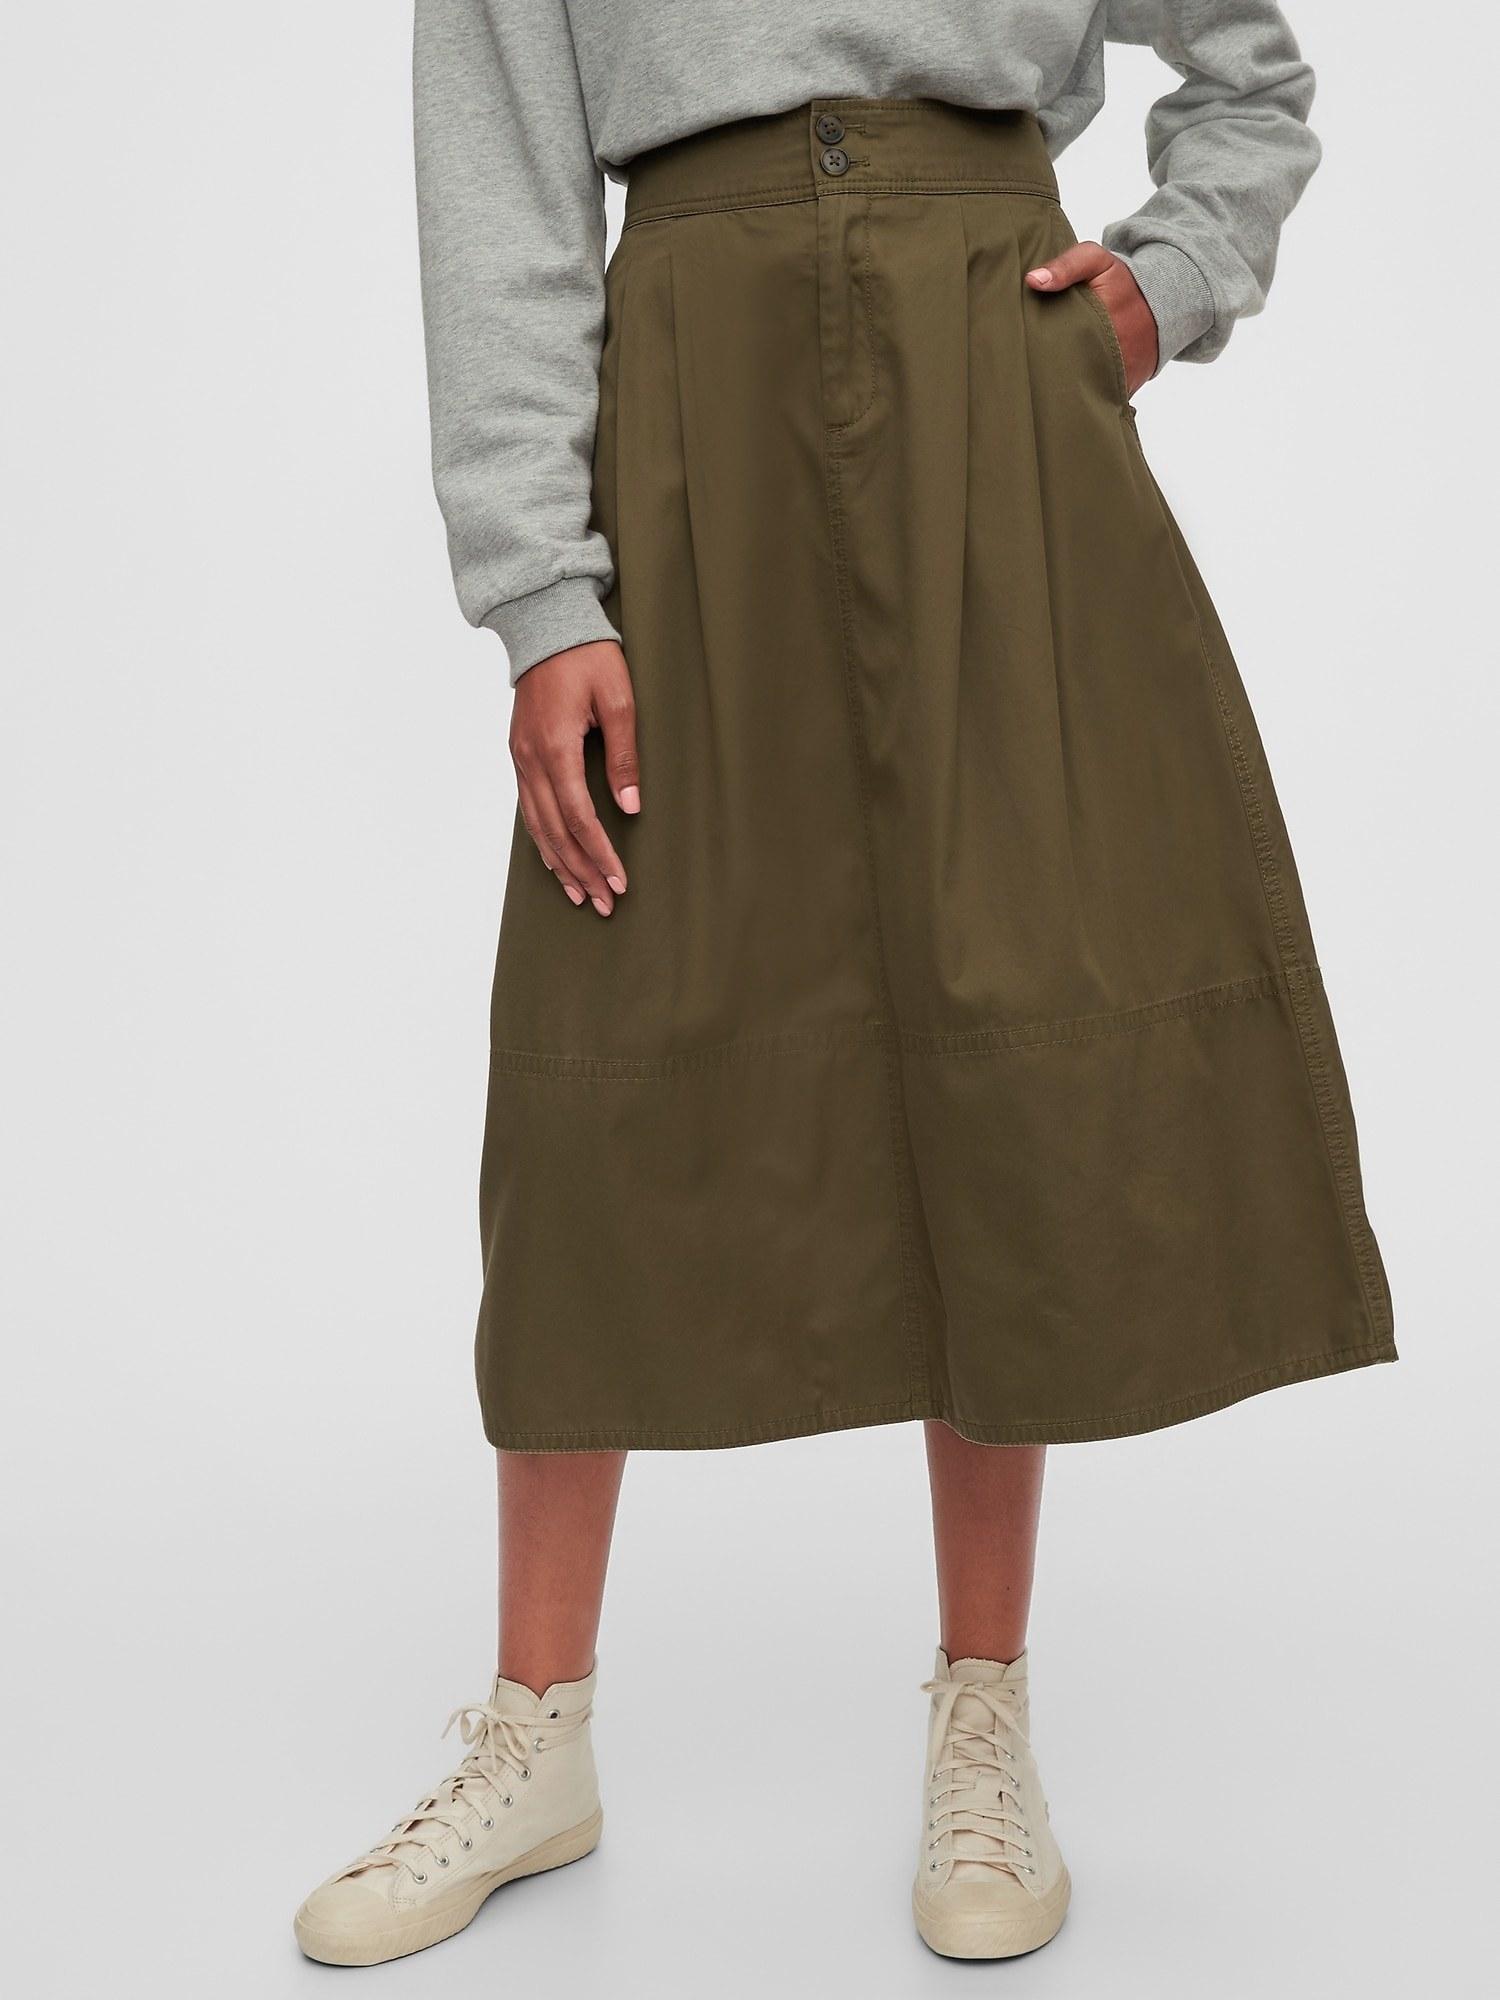 The olive green skirt